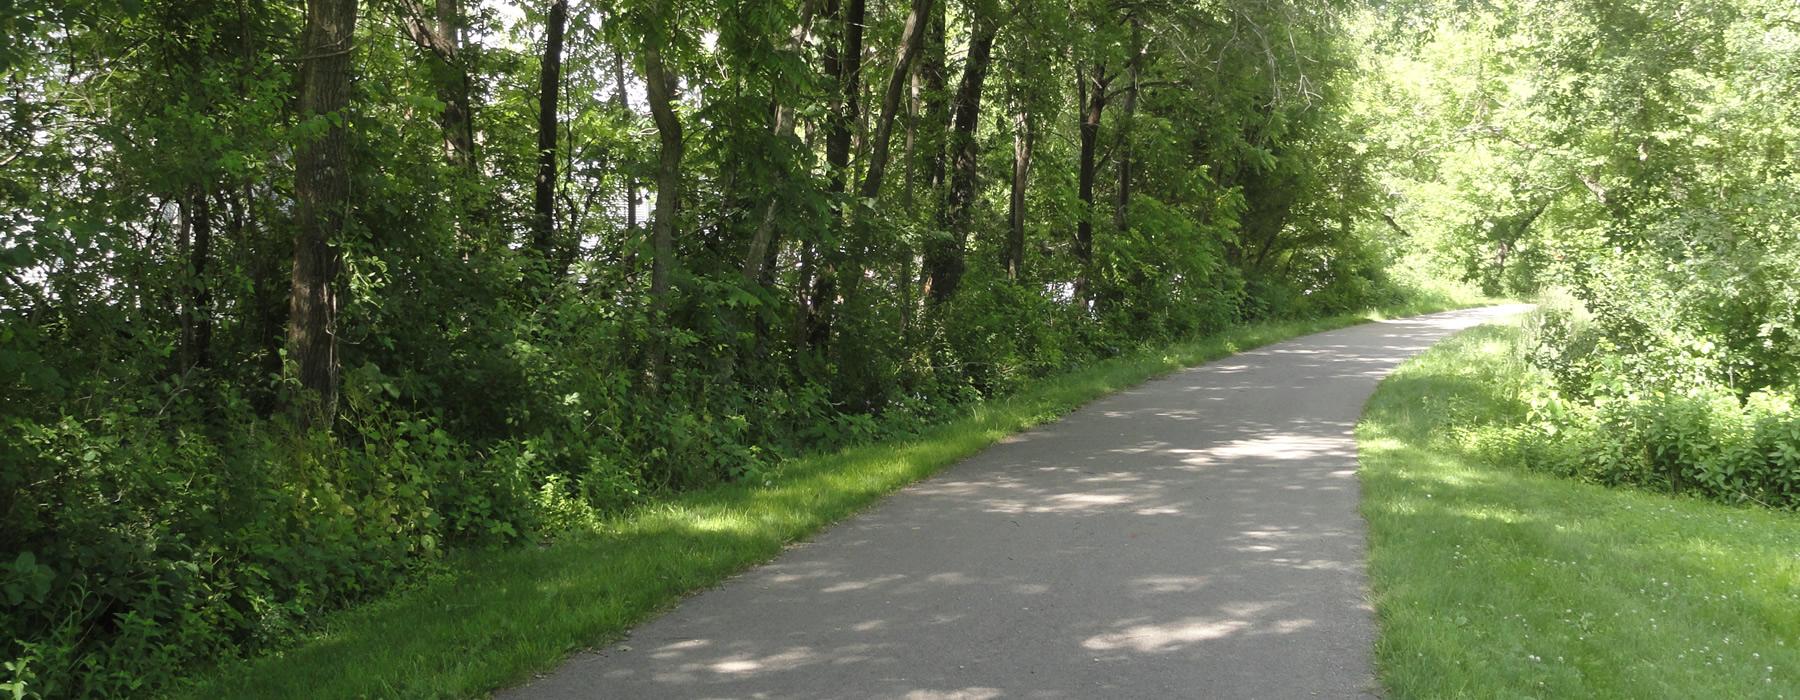 Root River State Bike Trail near Harmony MN